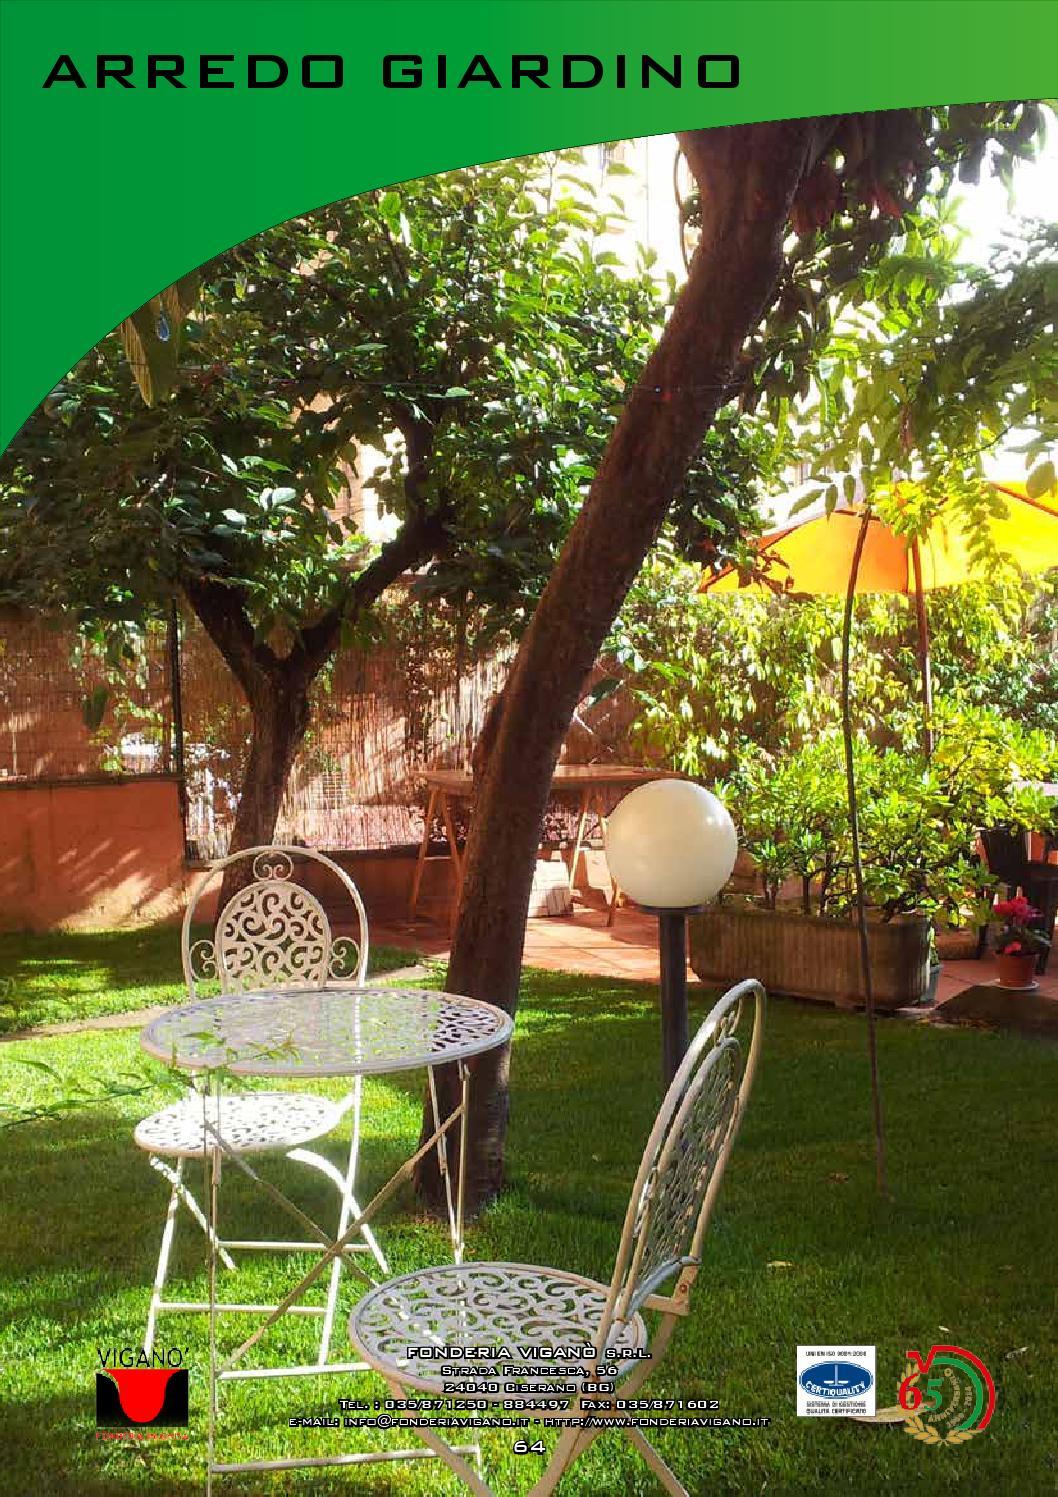 Catalogo arredo da giardino fonderia vigan 2016 by for Viridea catalogo arredo giardino